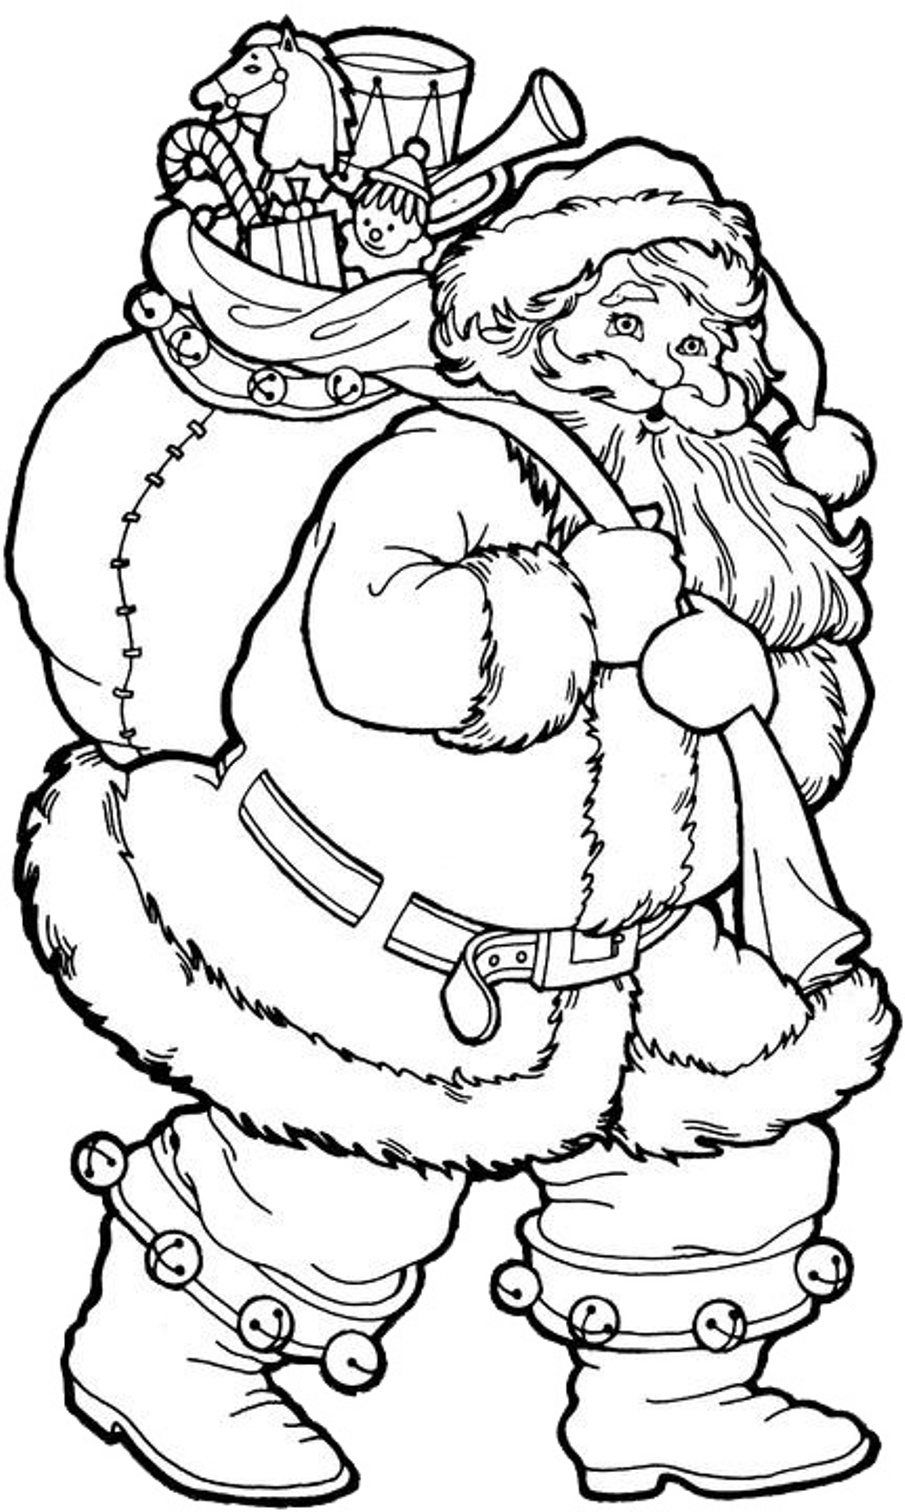 Christmas Coloring, Christmas Coloring Pages Printable Santa With ...